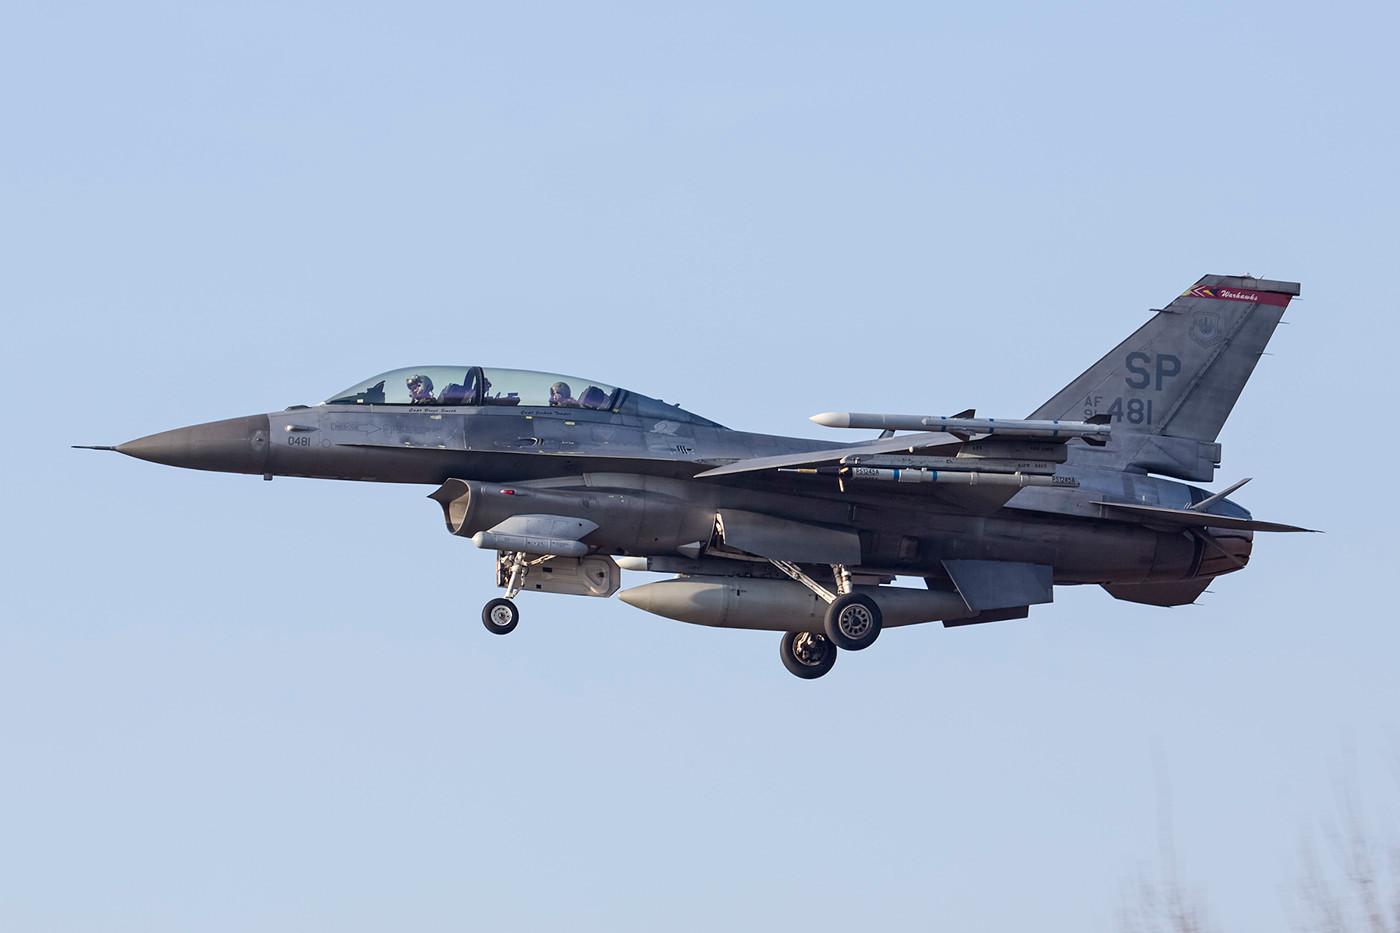 SPM 13.02.2015; 91-0481, F-16D, 52nd FW Spangdahlem (Deutschland)